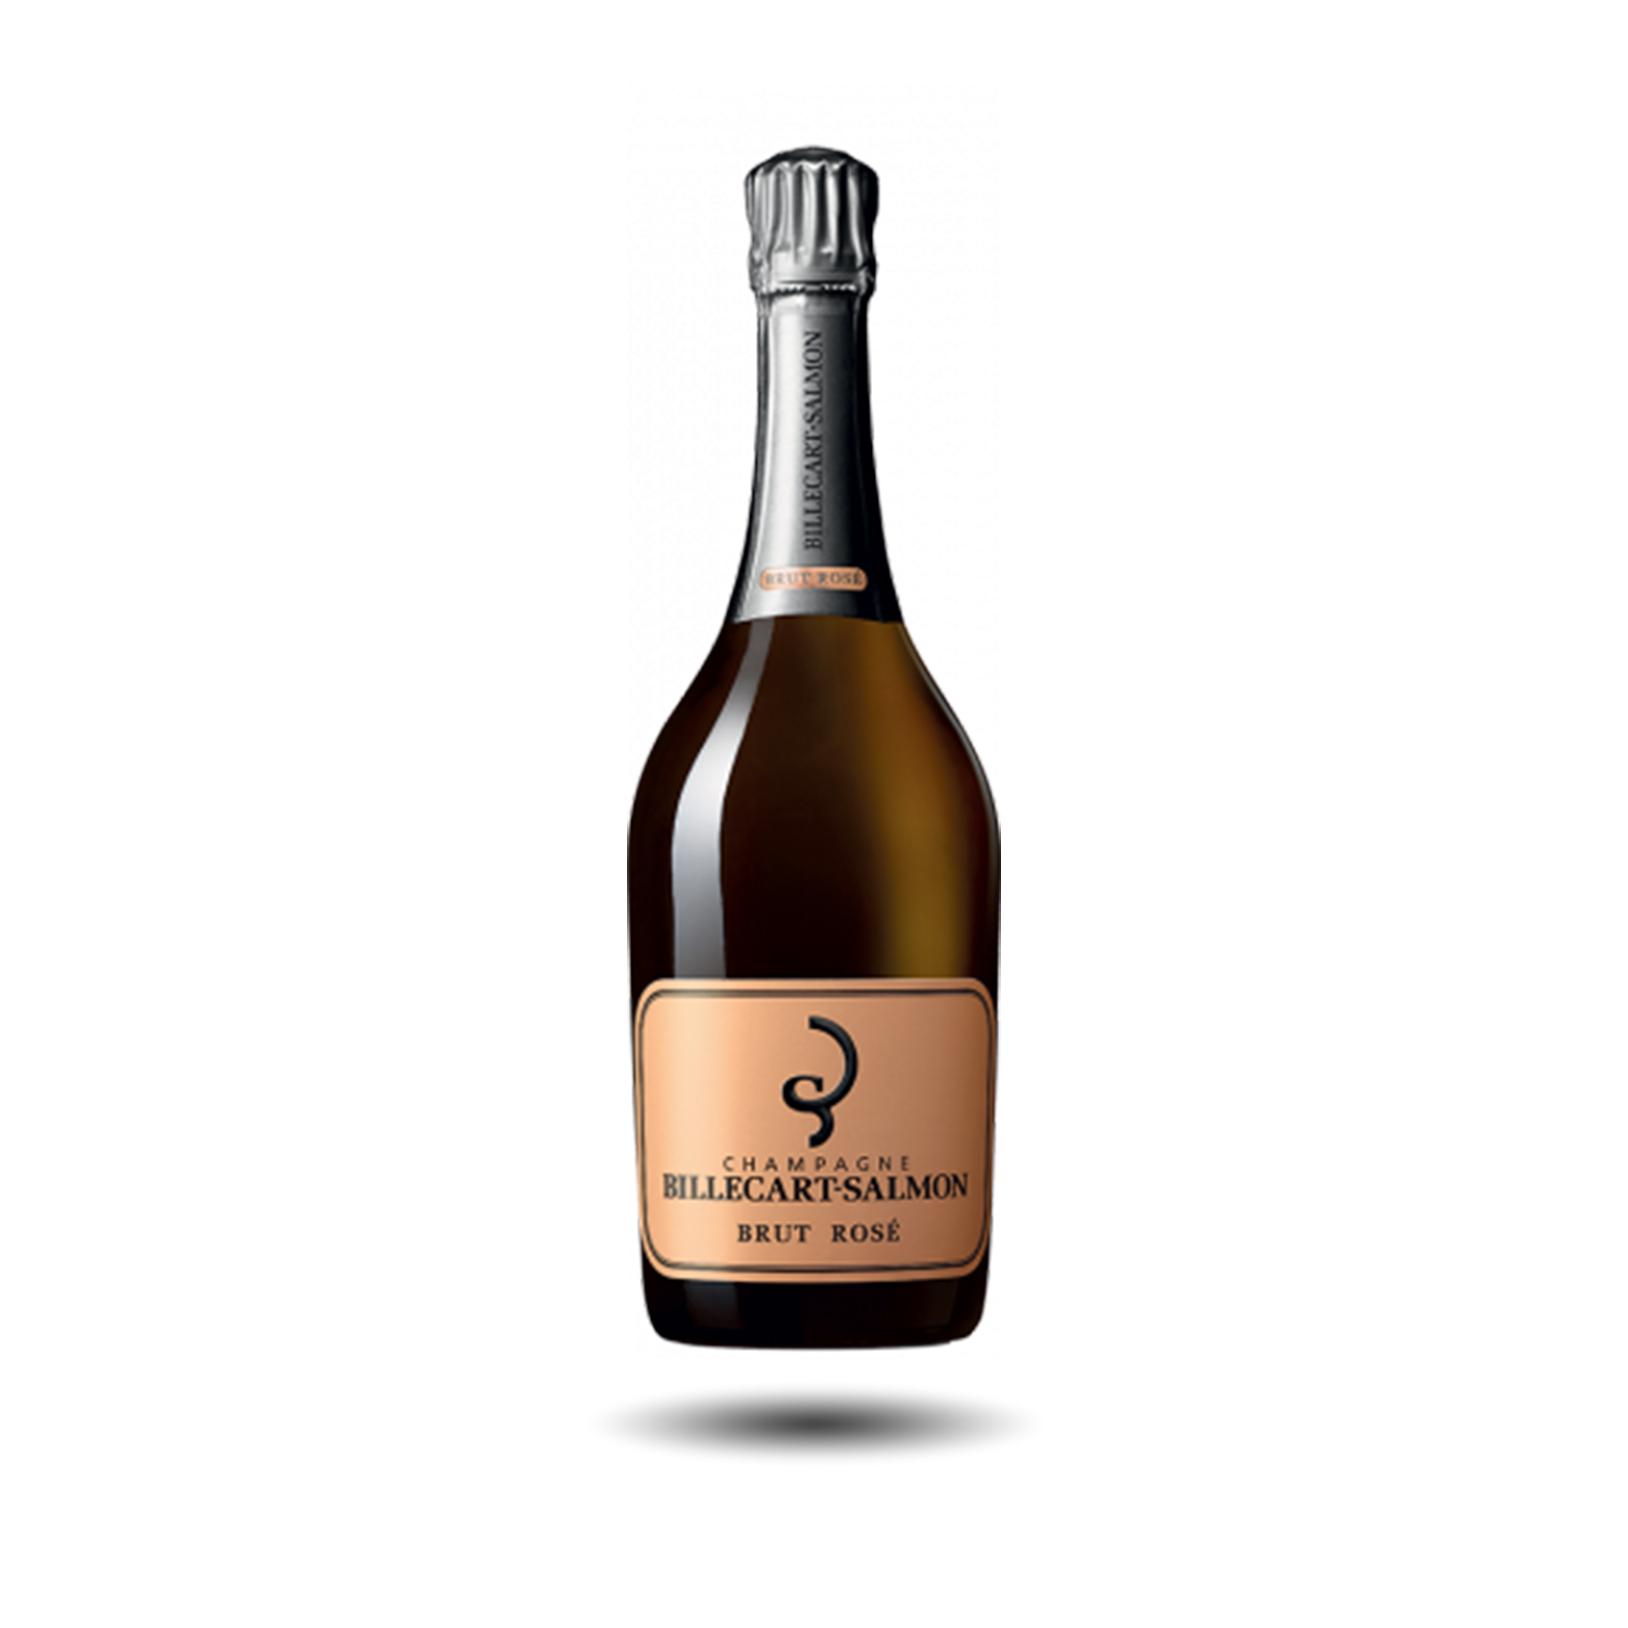 Champagne Billecart-Salmon - Brut, Rosé